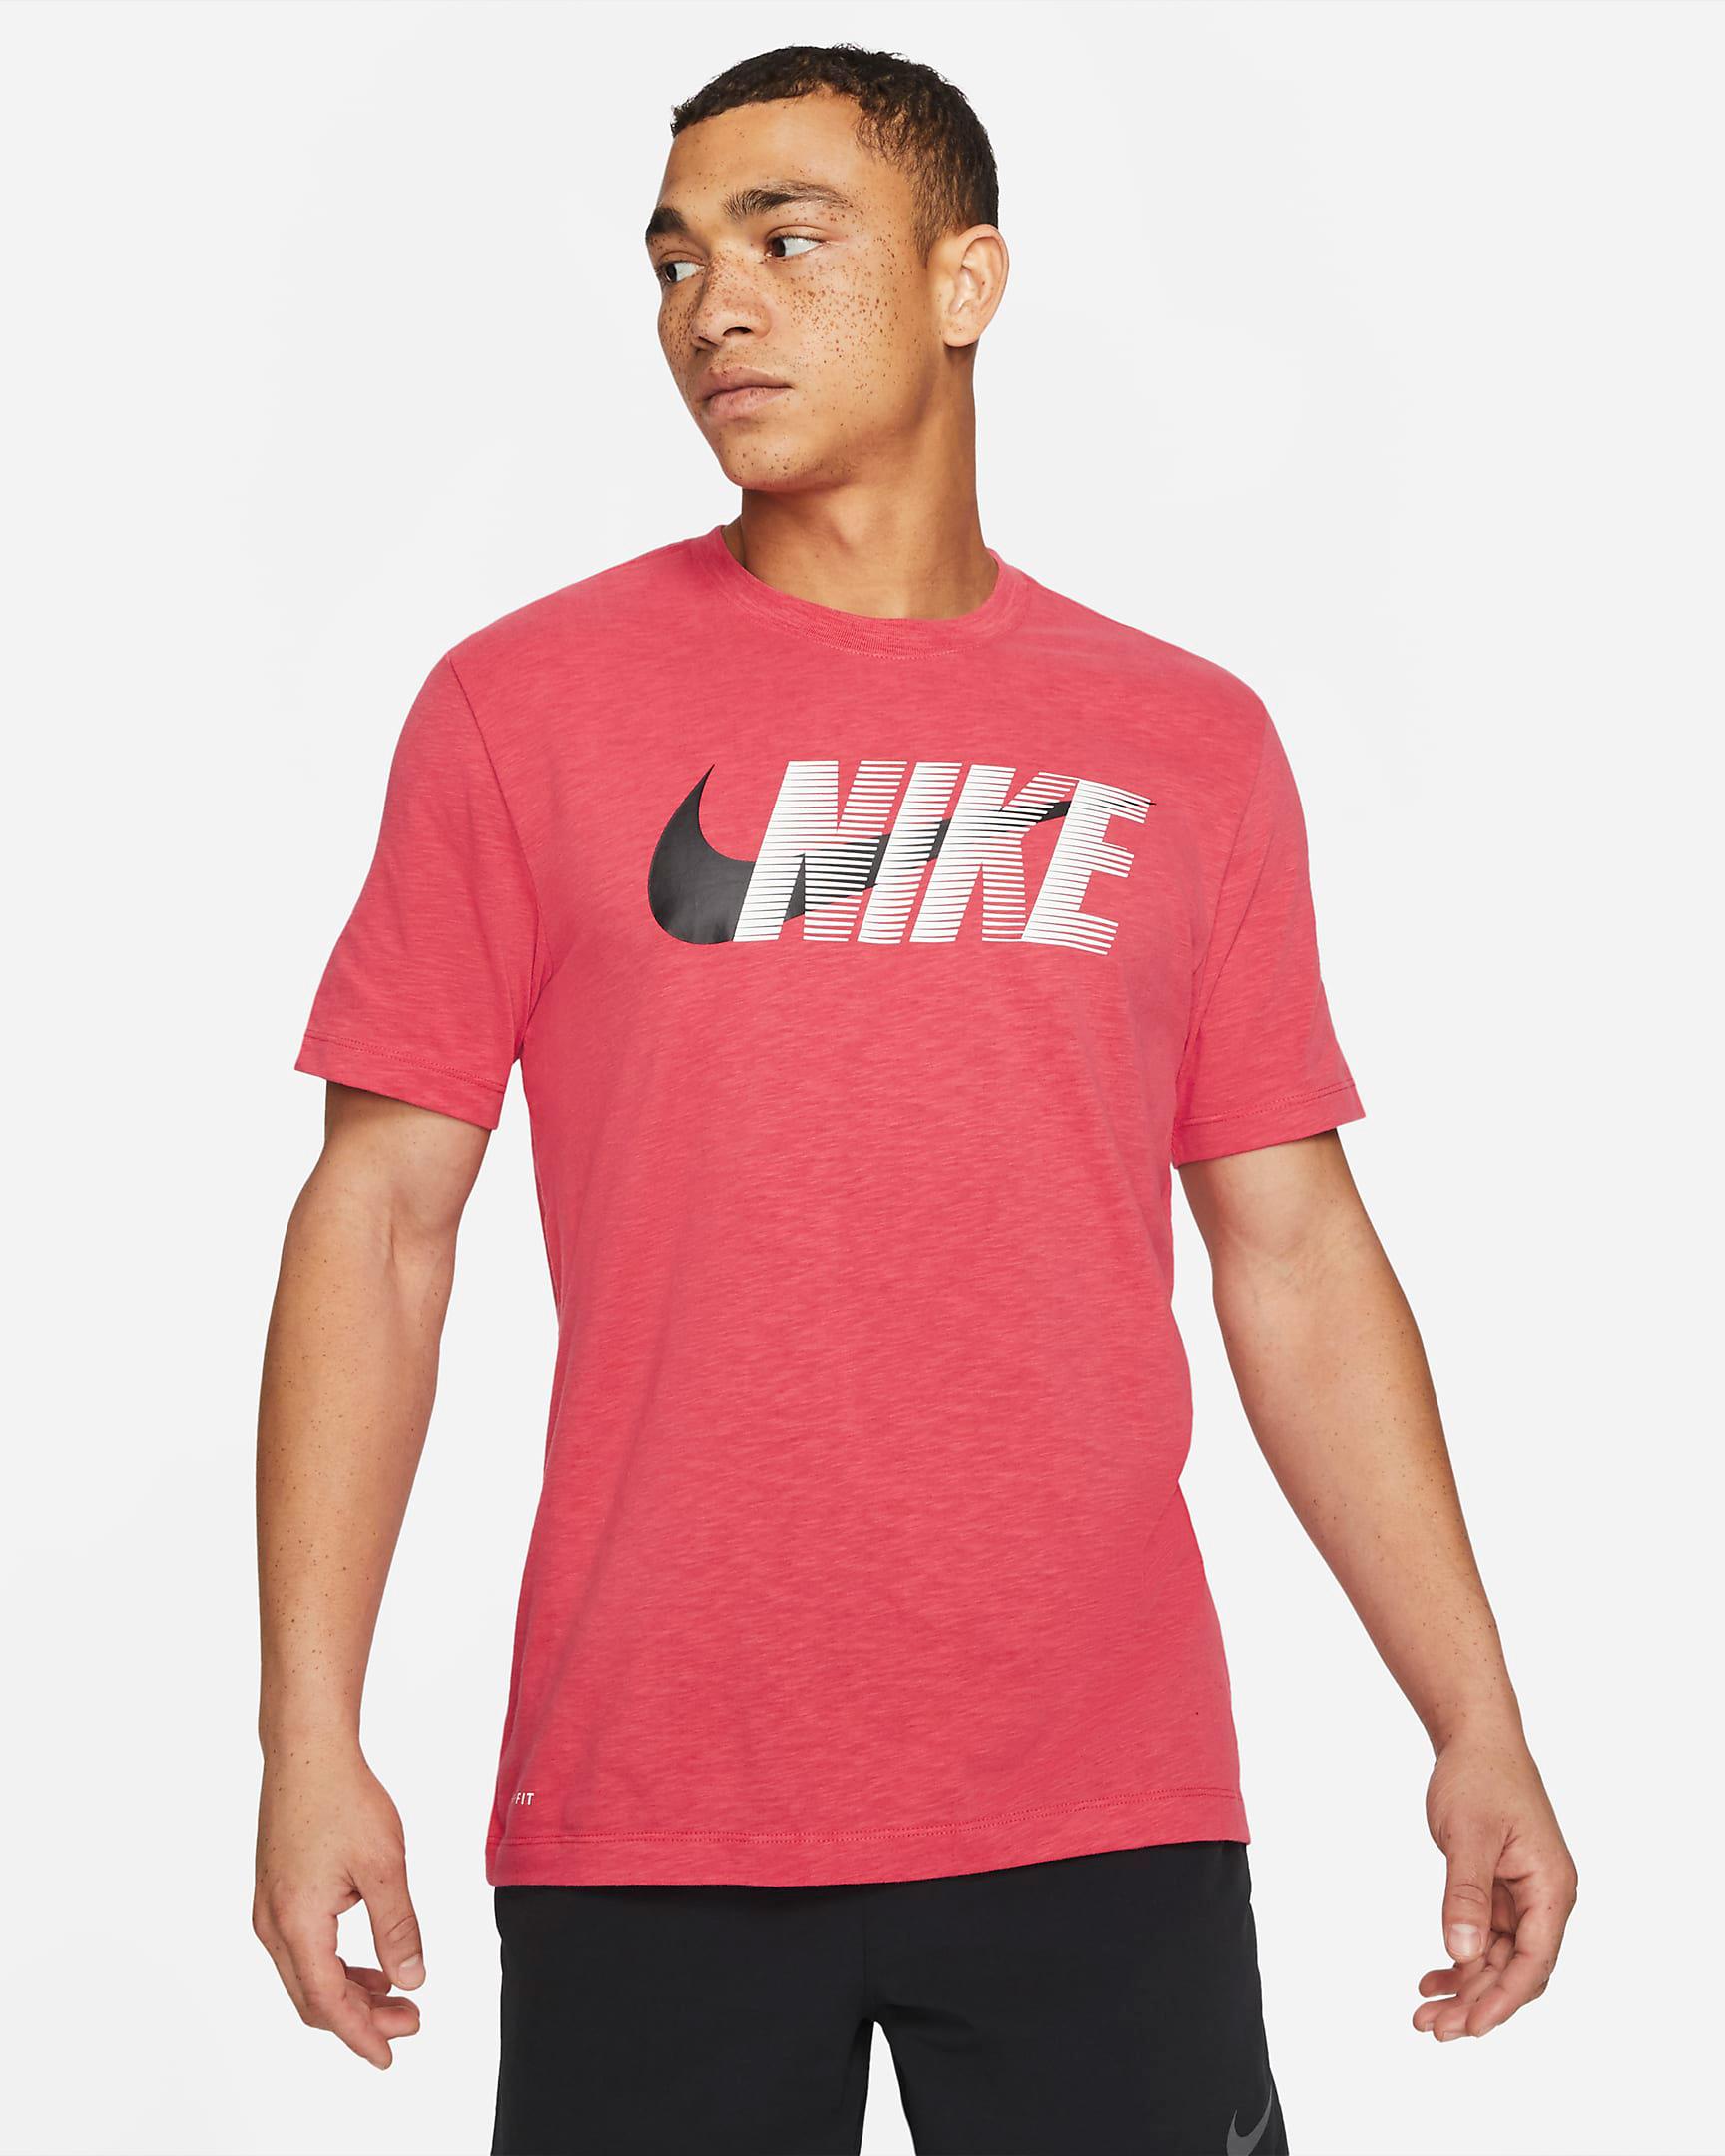 nike-light-fusion-red-shirt